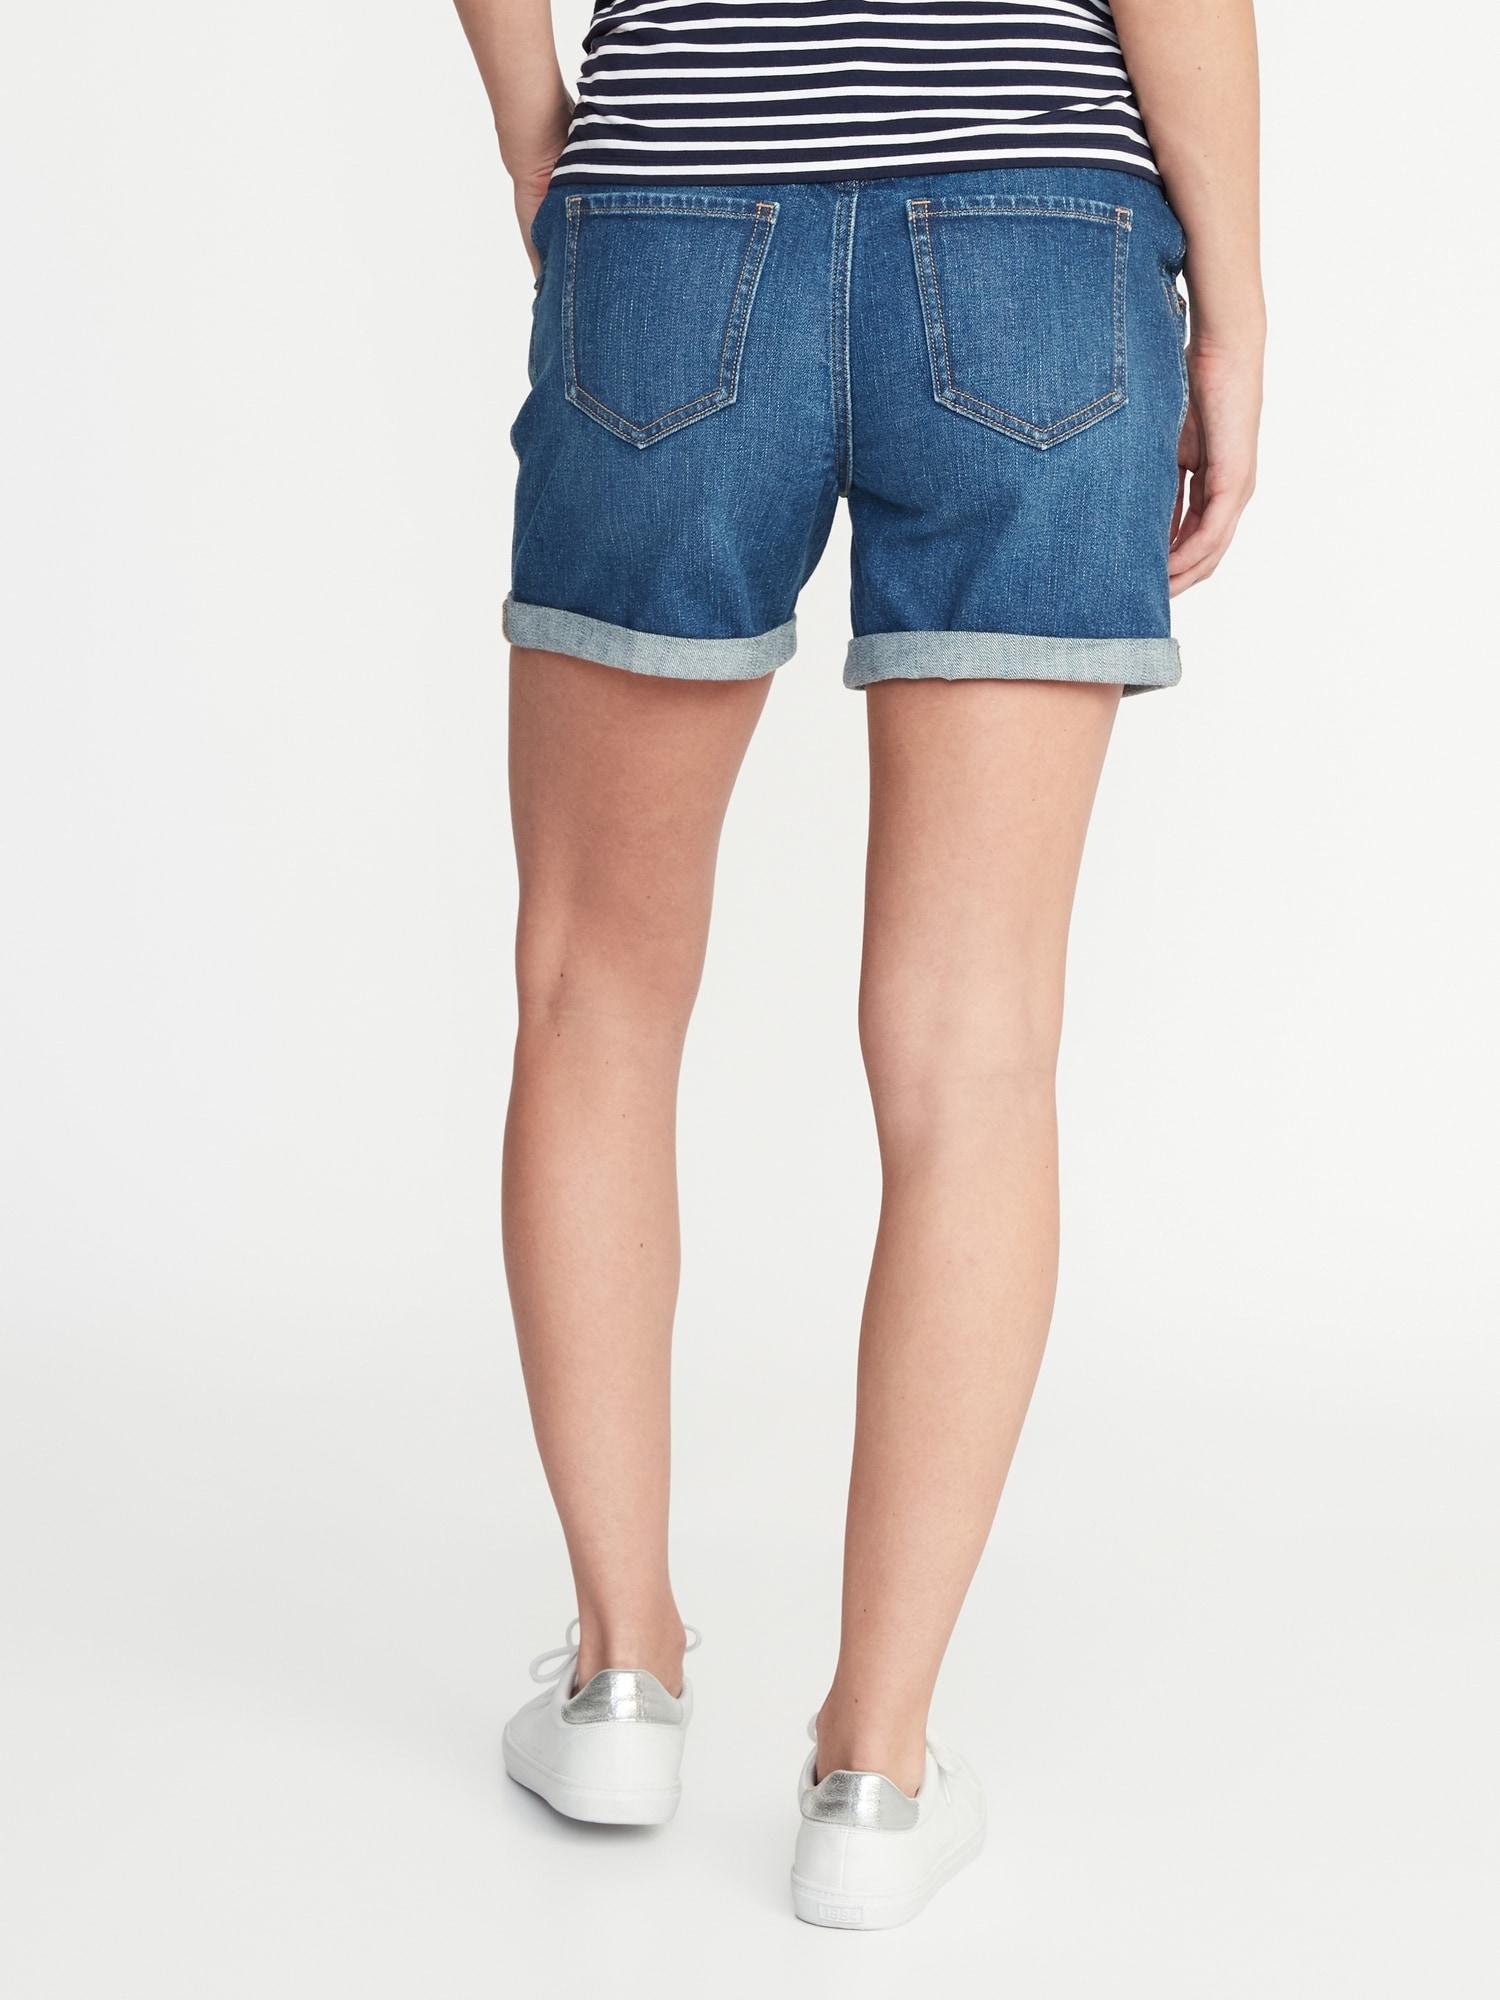 9829180d0e Old Navy. Women's Blue Maternity Front-low Panel Distressed Boyfriend Denim  Shorts